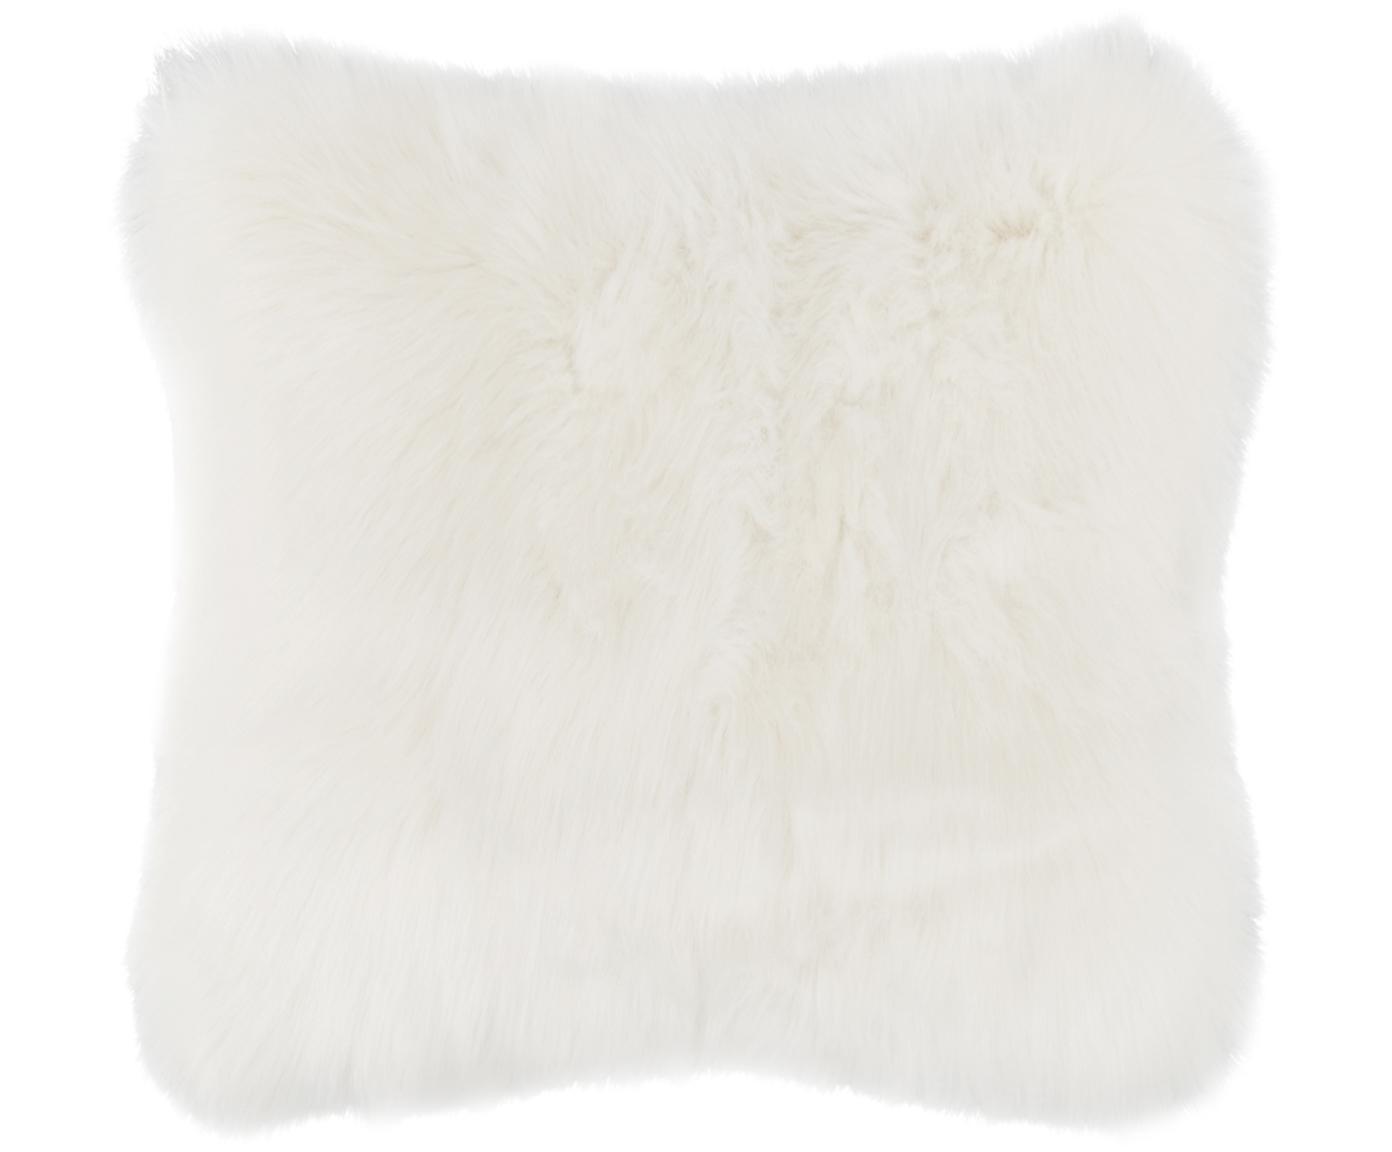 Flauschige Kunstfell-Kissenhülle Mathilde, glatt, Vorderseite: 67% Acryl, 33% Polyester, Rückseite: 100% Polyester, Creme, 40 x 40 cm